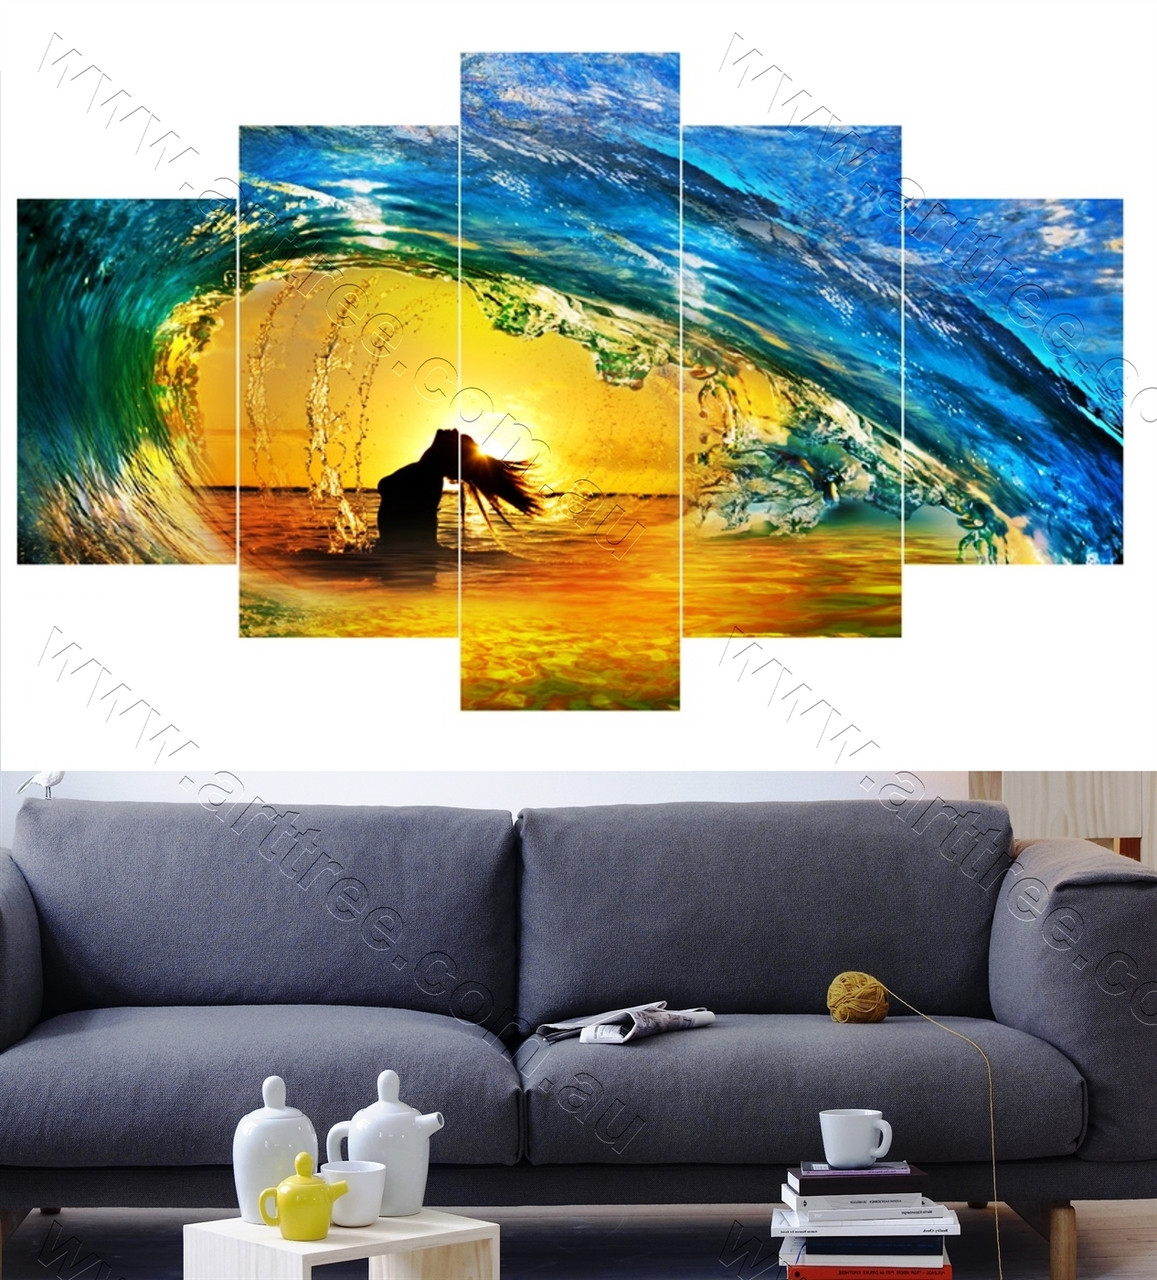 Girl and Water splash - Arttree